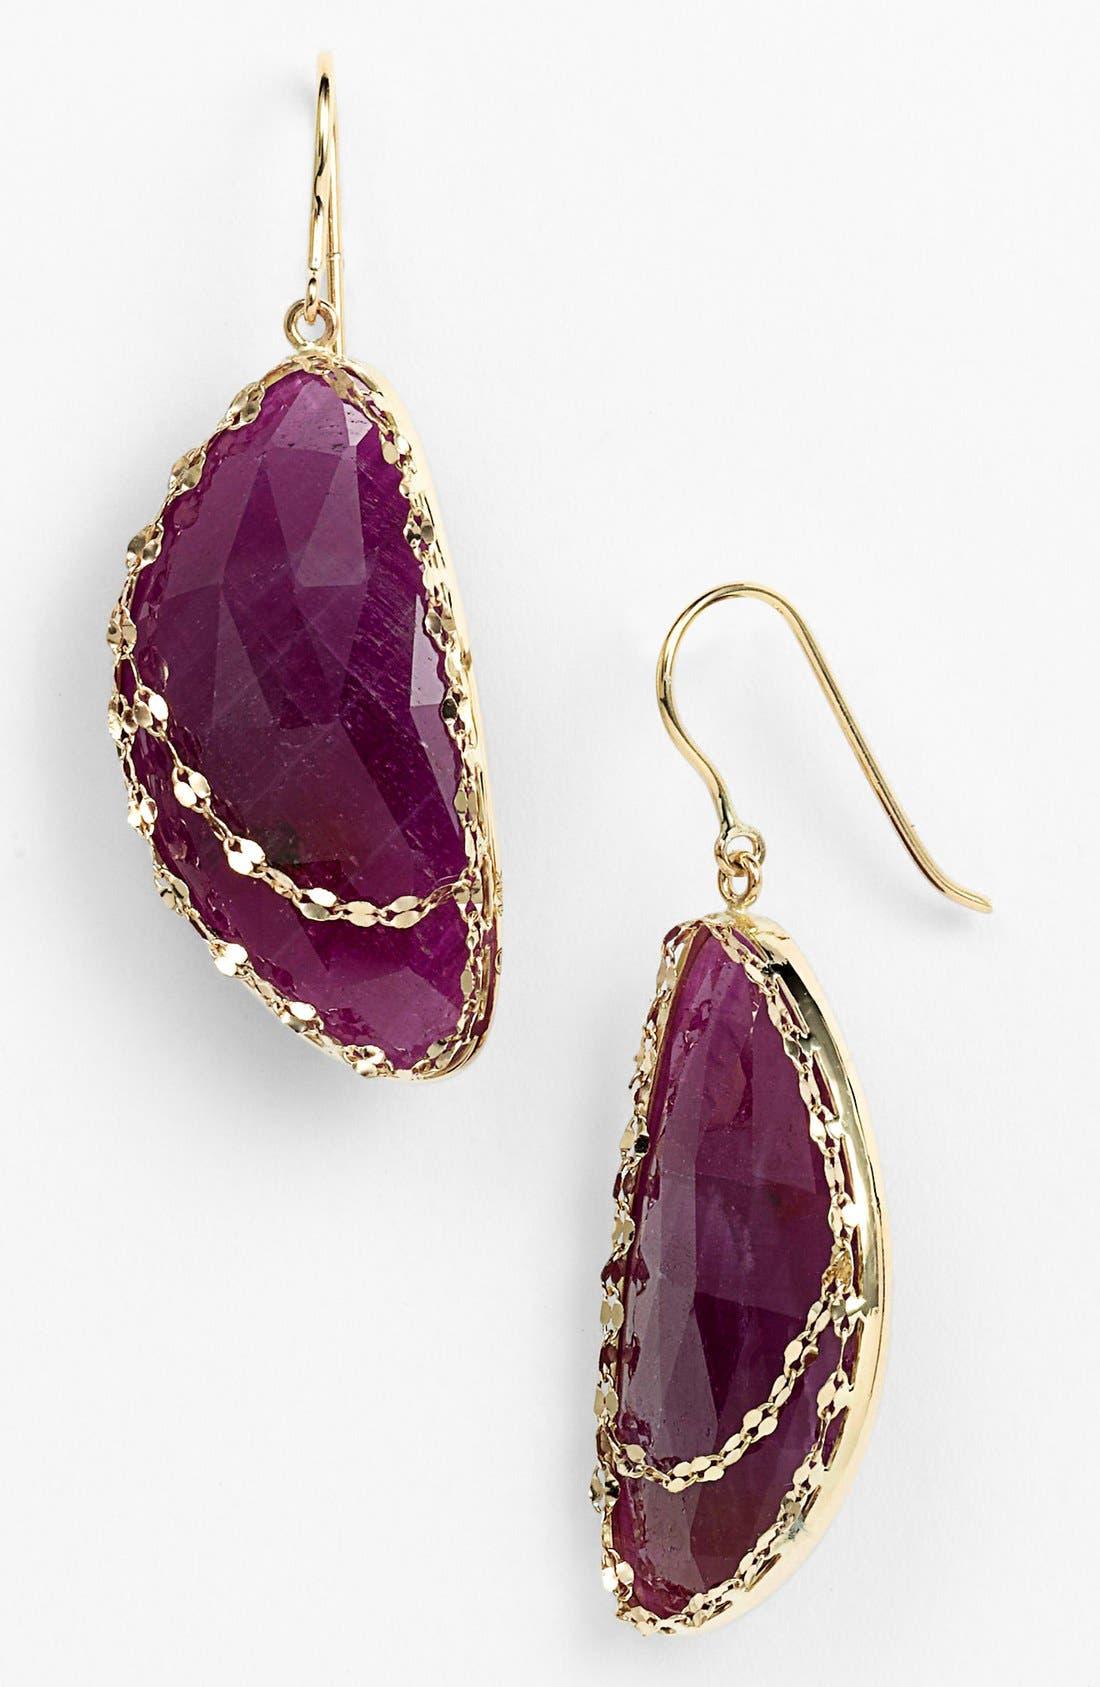 Main Image - Lana Jewelry 'Stone Gold - Eden' Sapphire Drop Earrings